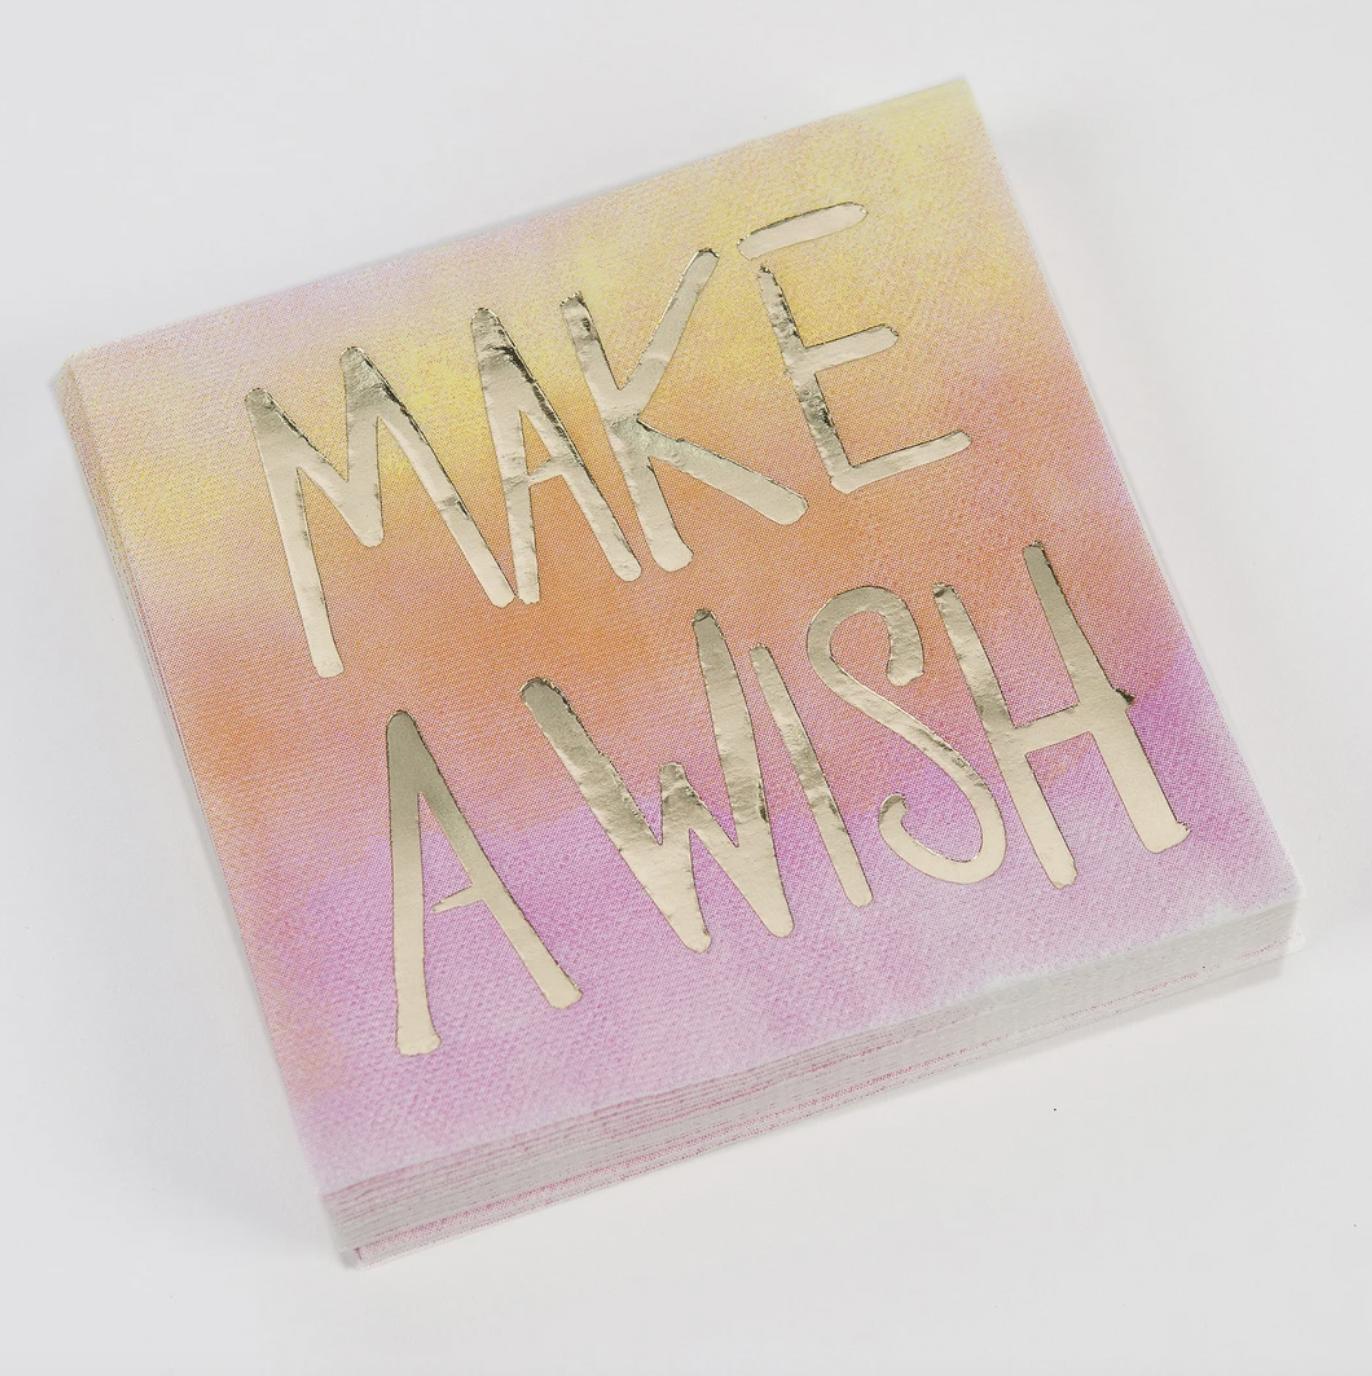 DTHY: Make A Wish Napkin